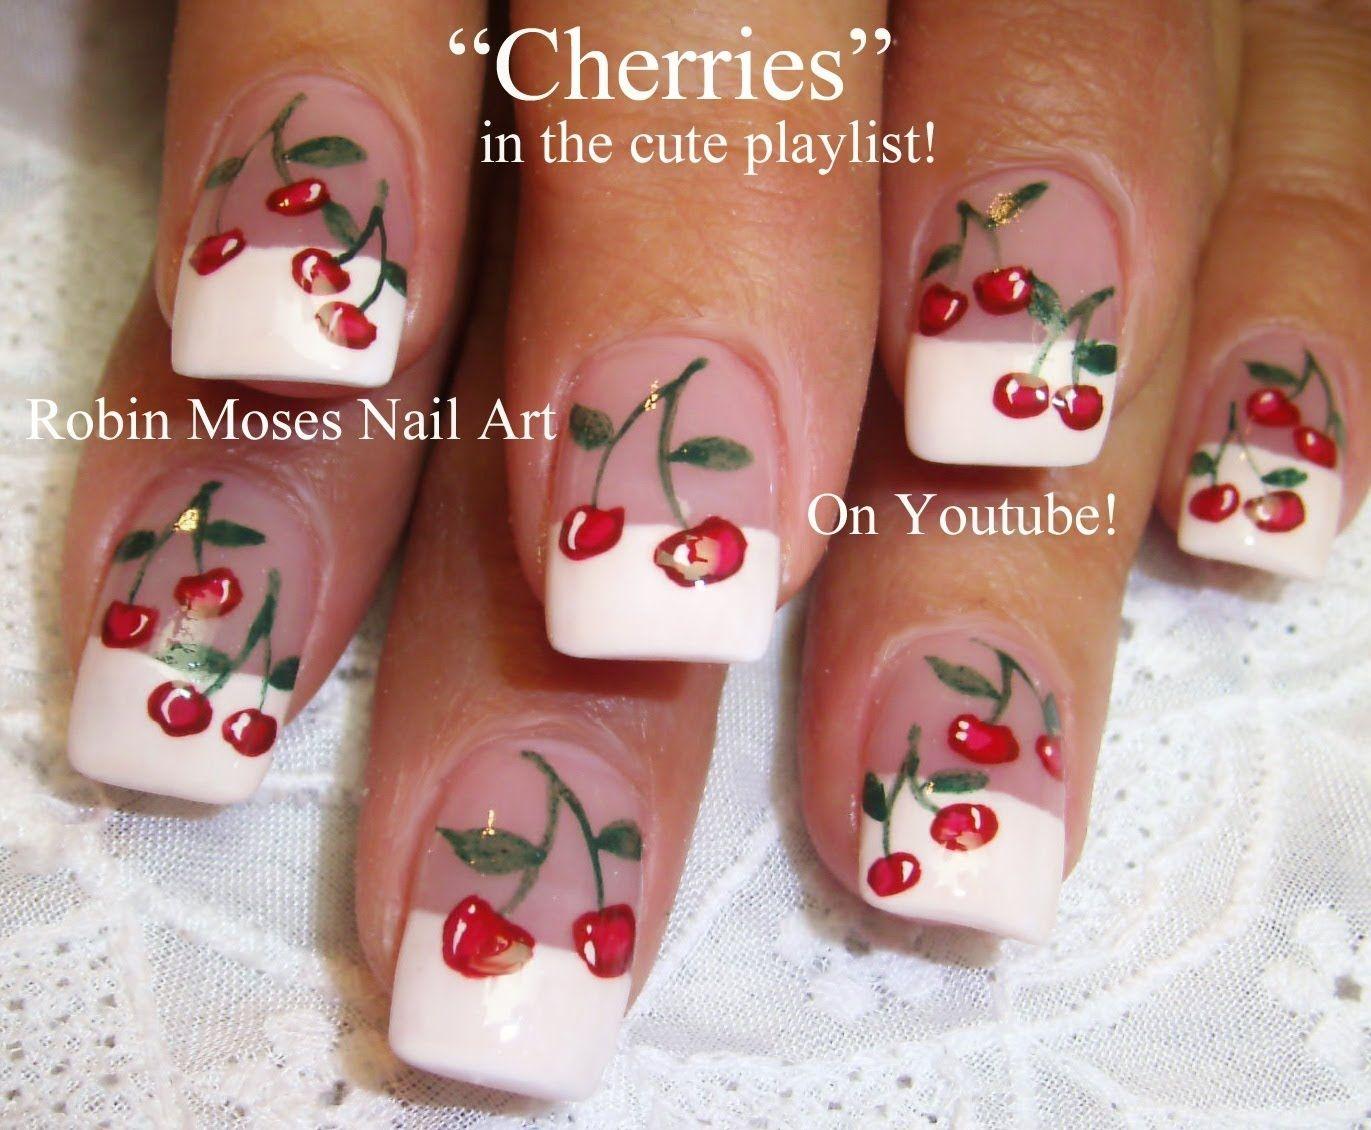 Nail Art - Cherries! | robin moses nail art videos | Pinterest ...